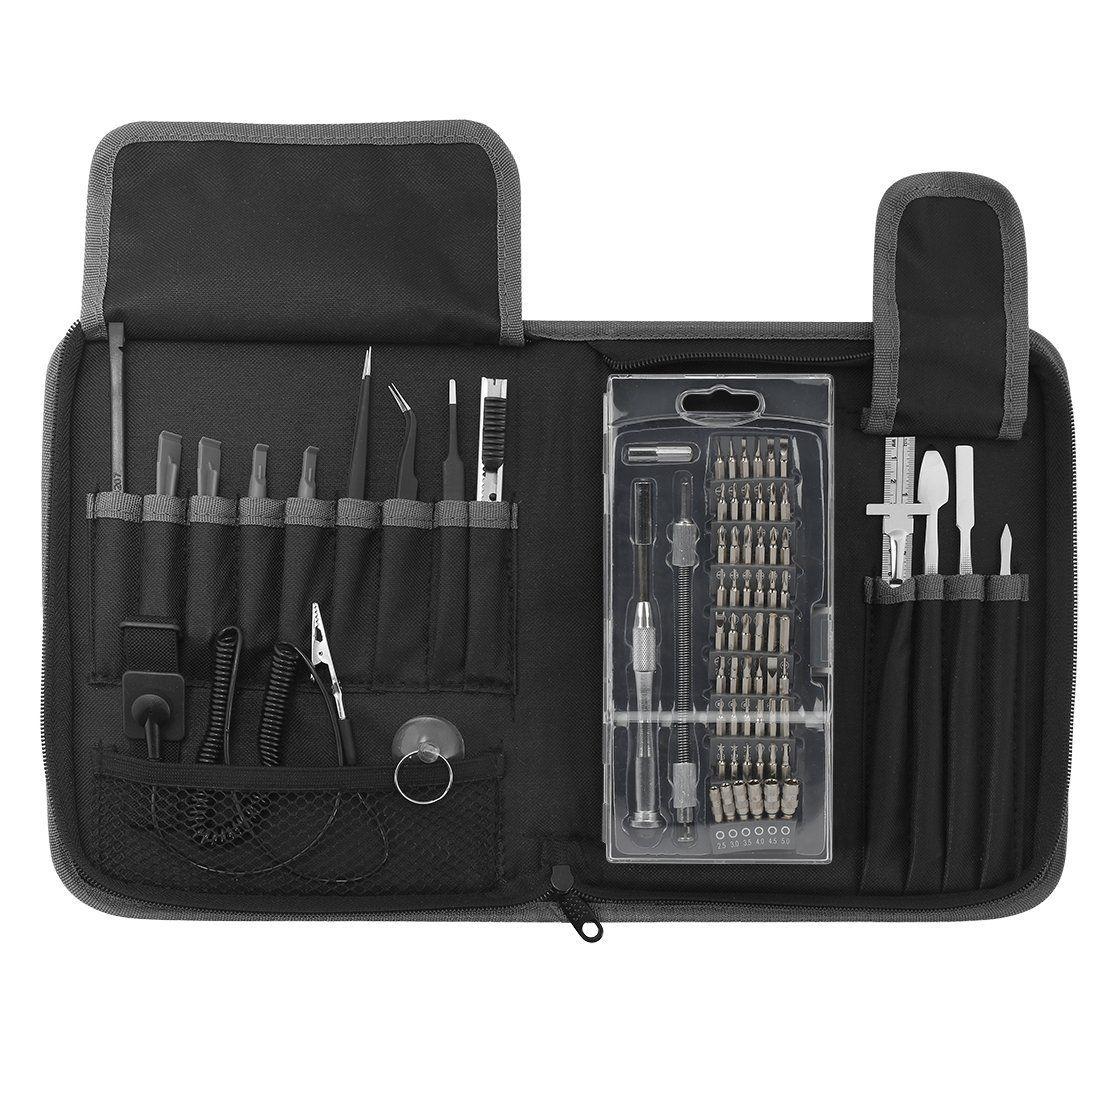 AmazonBasics Electronics Tool Kit Sale 20.99 My pins